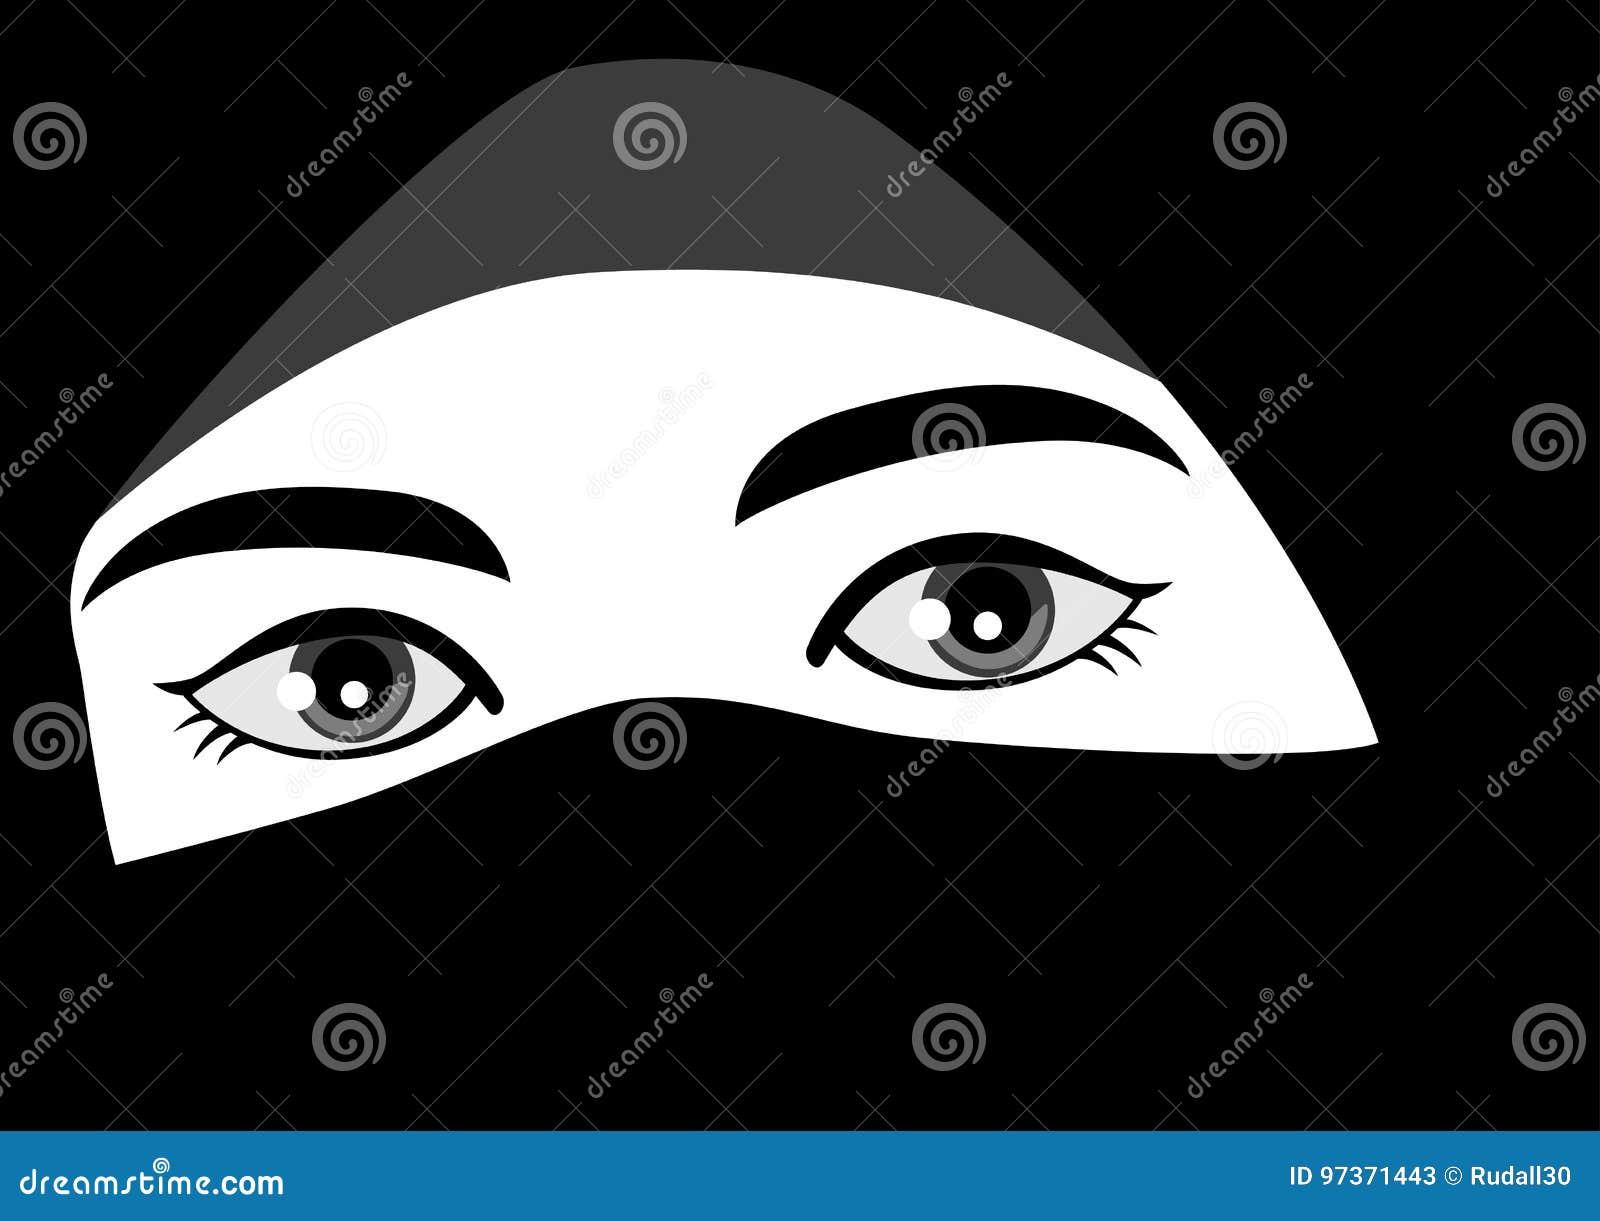 Black and white illustration of muslim woman wearing hijab or niqab